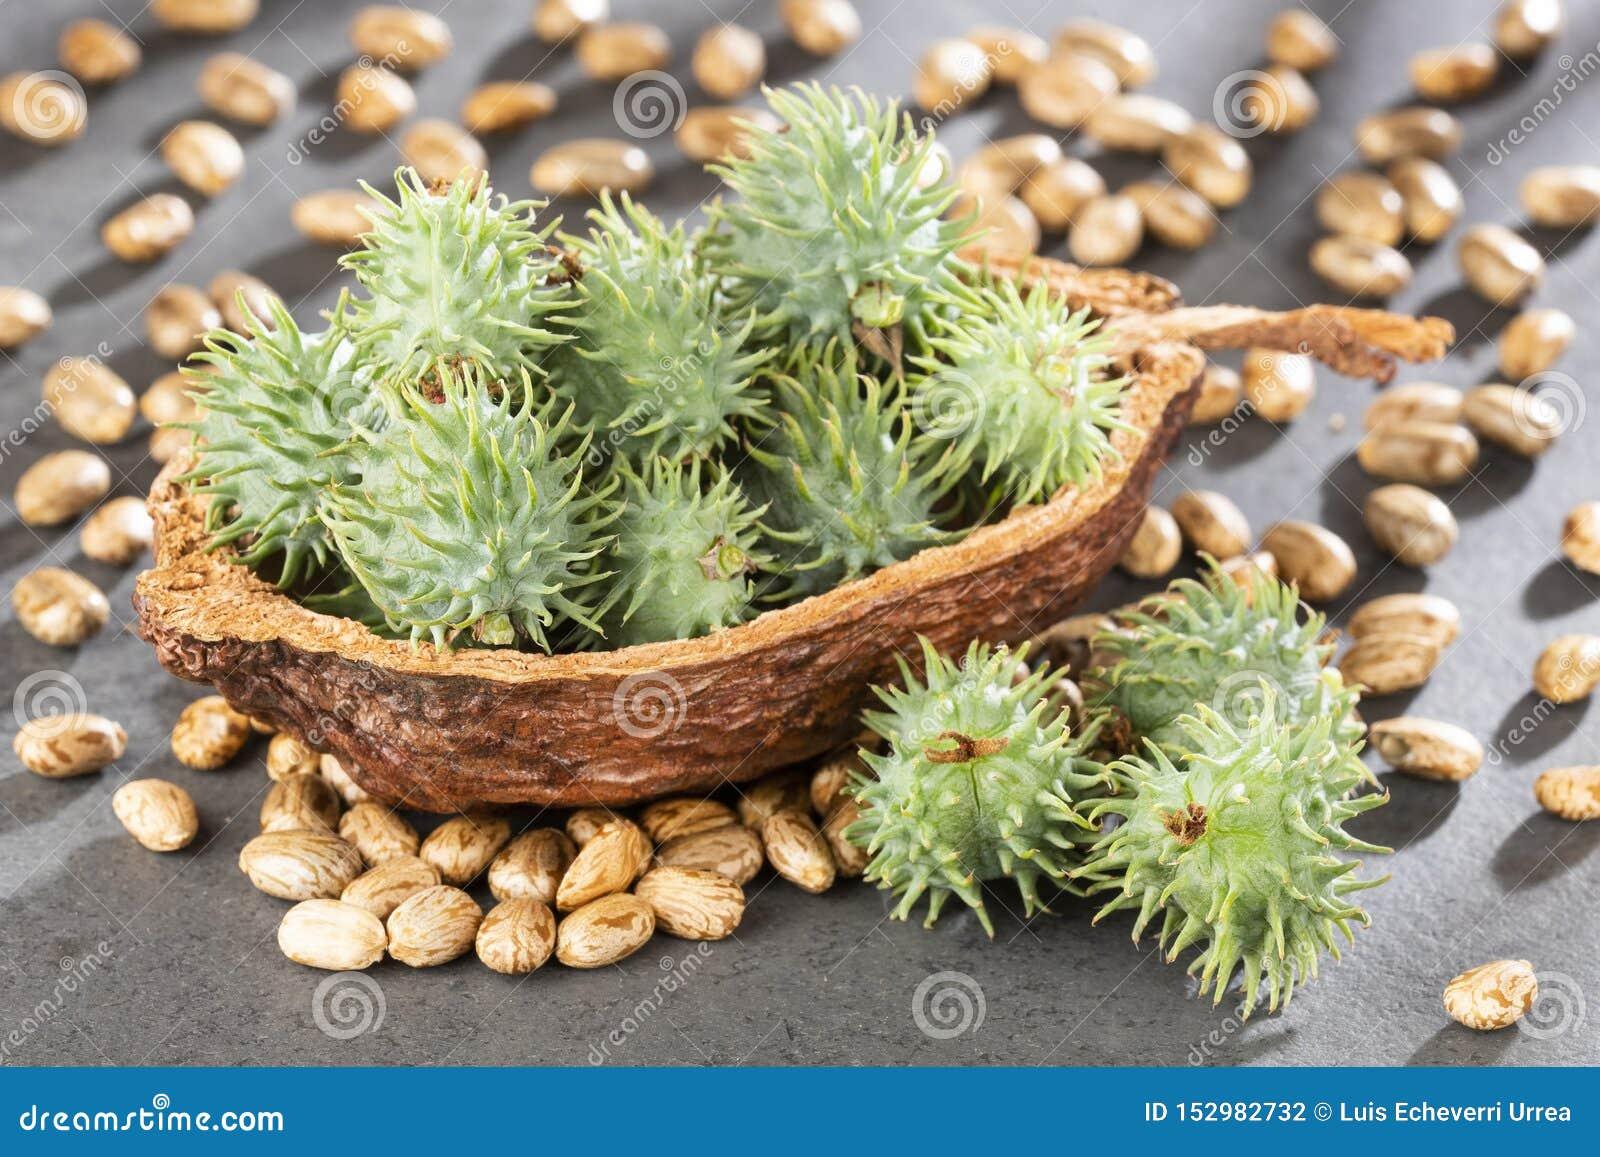 Ricinus communis - Green castor seeds. Text space